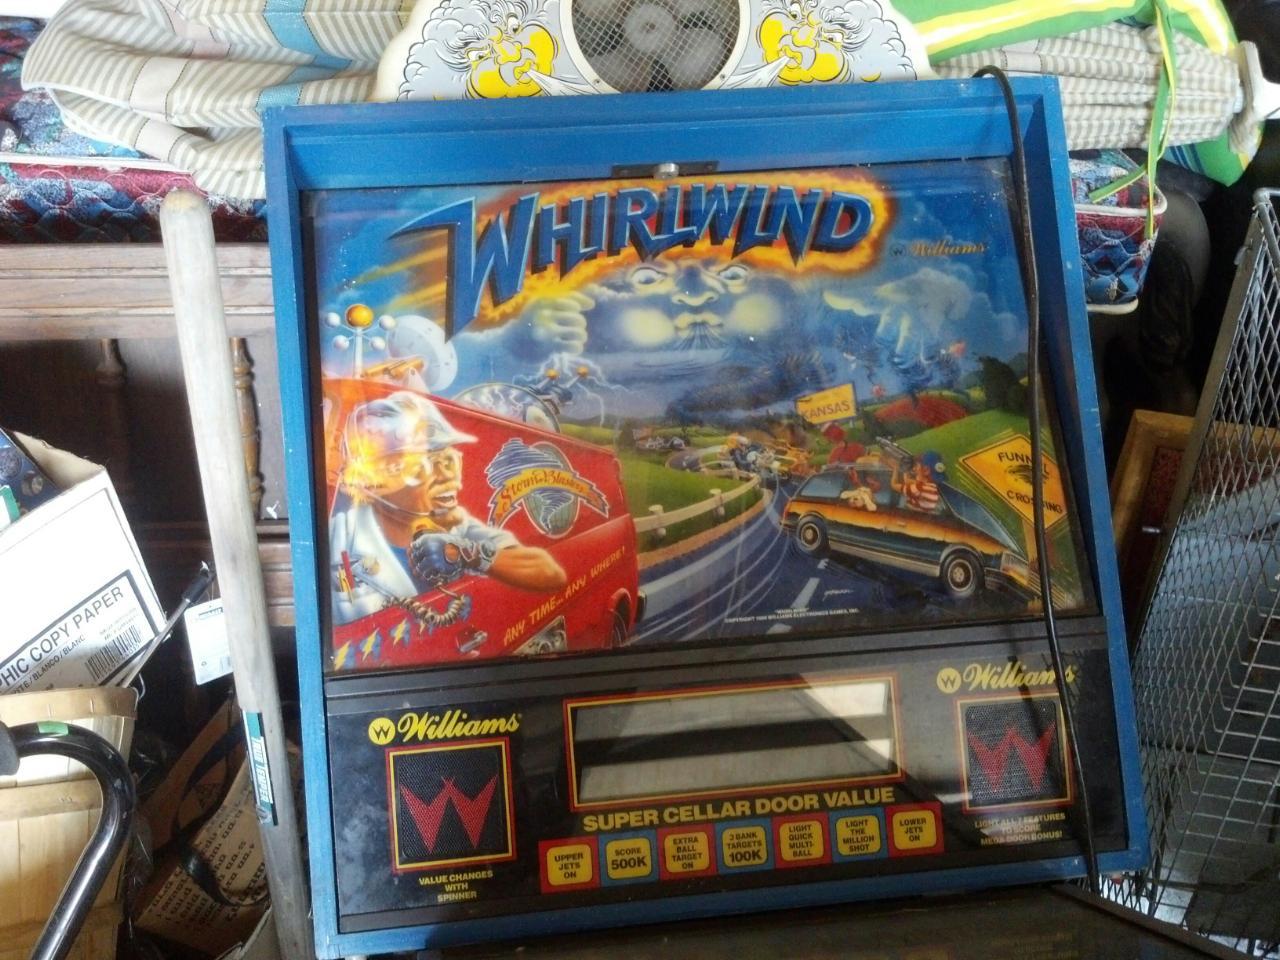 Whirlwind Pinball Machine For Sale In Michigan